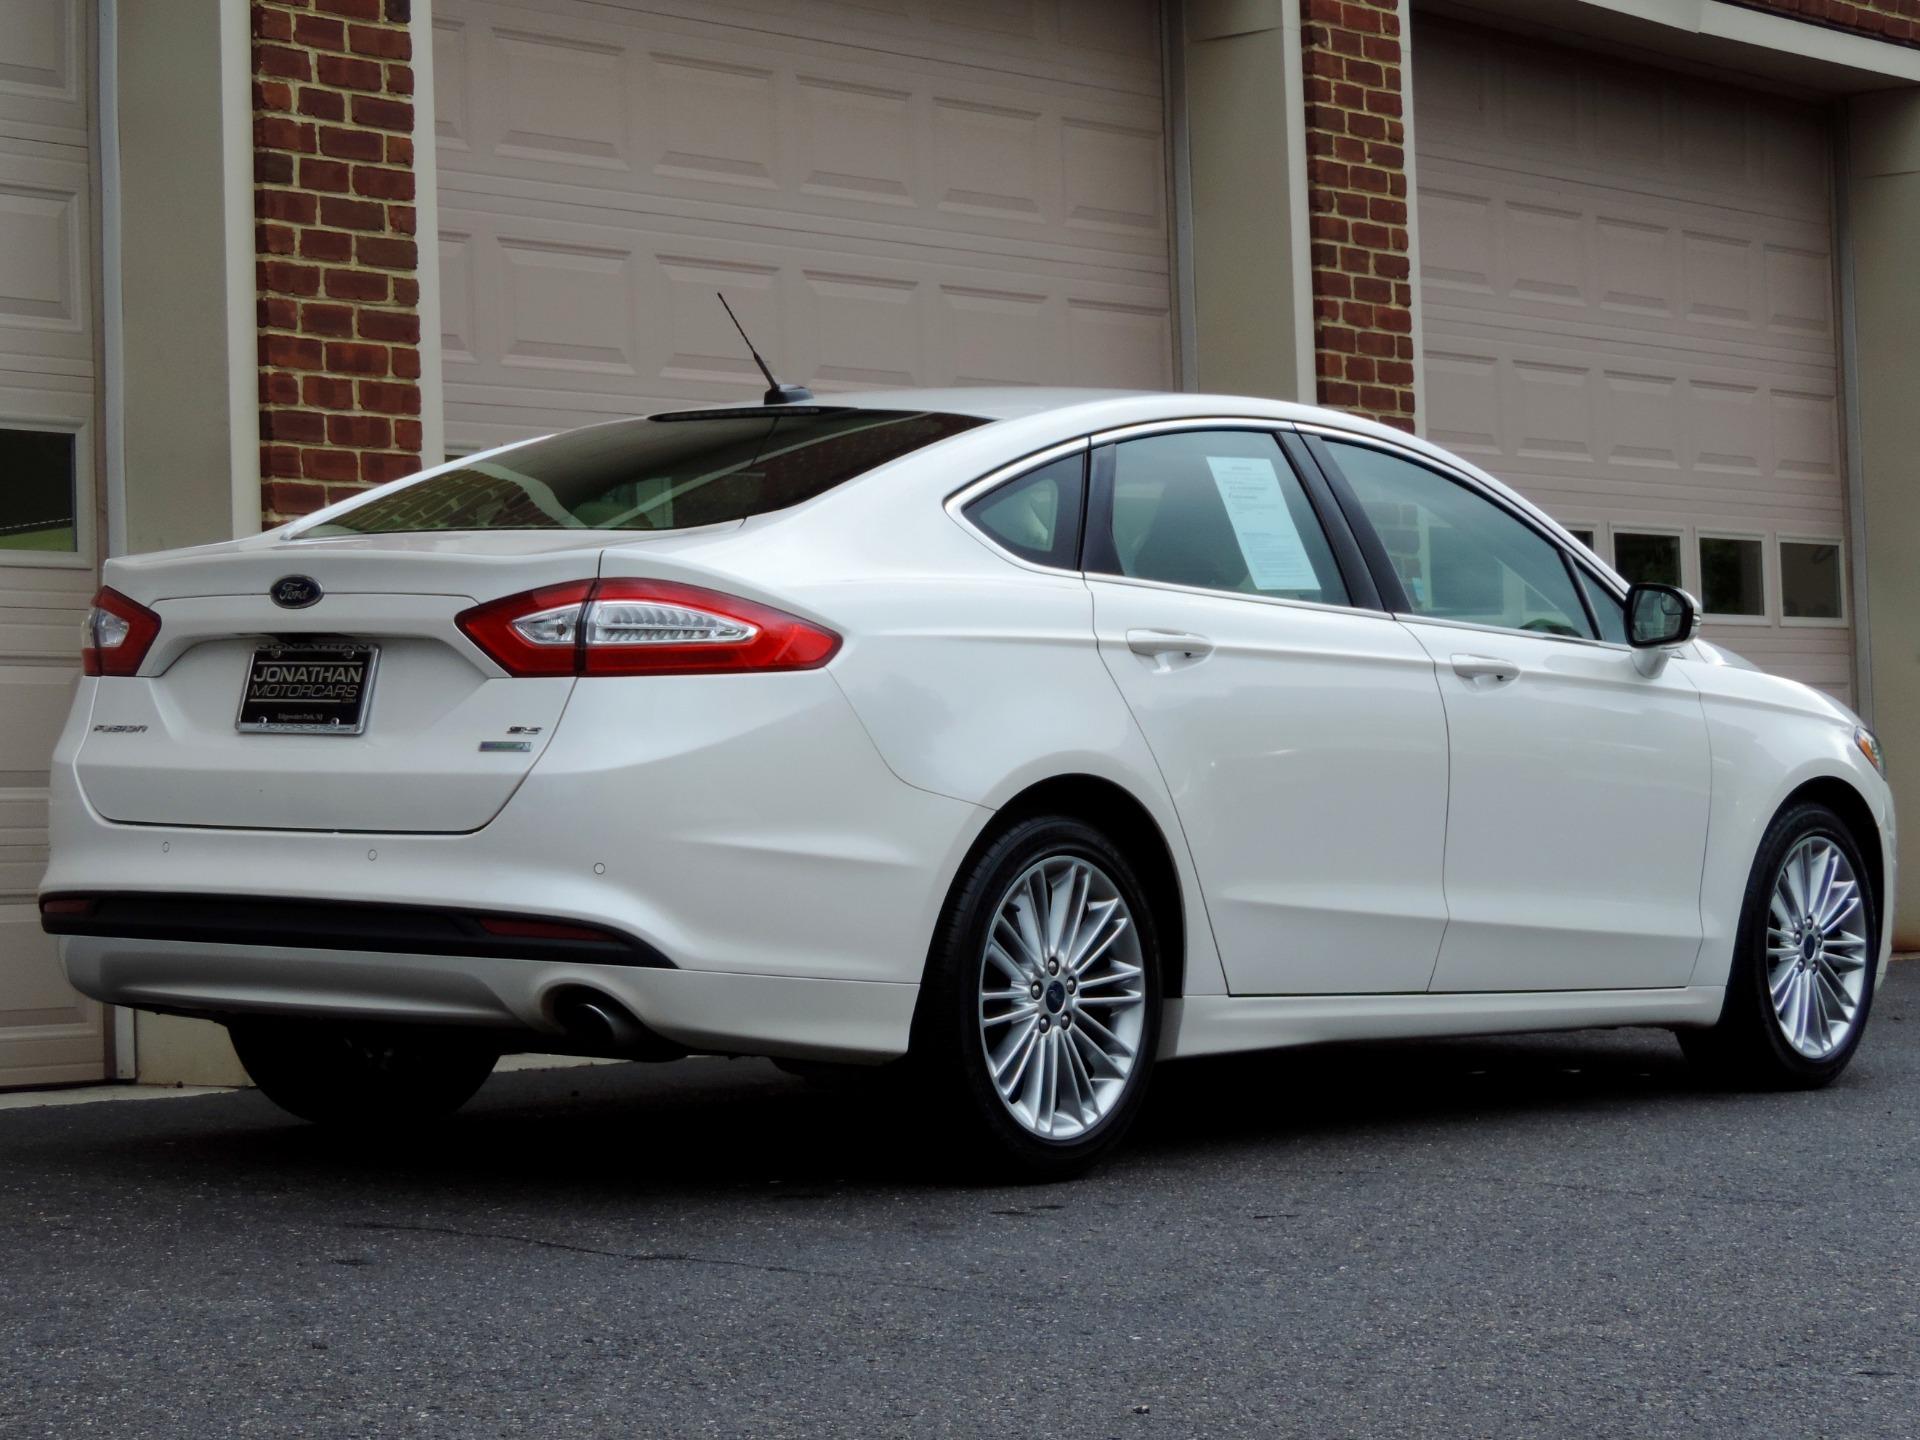 Used-2016-Ford-Fusion-SE